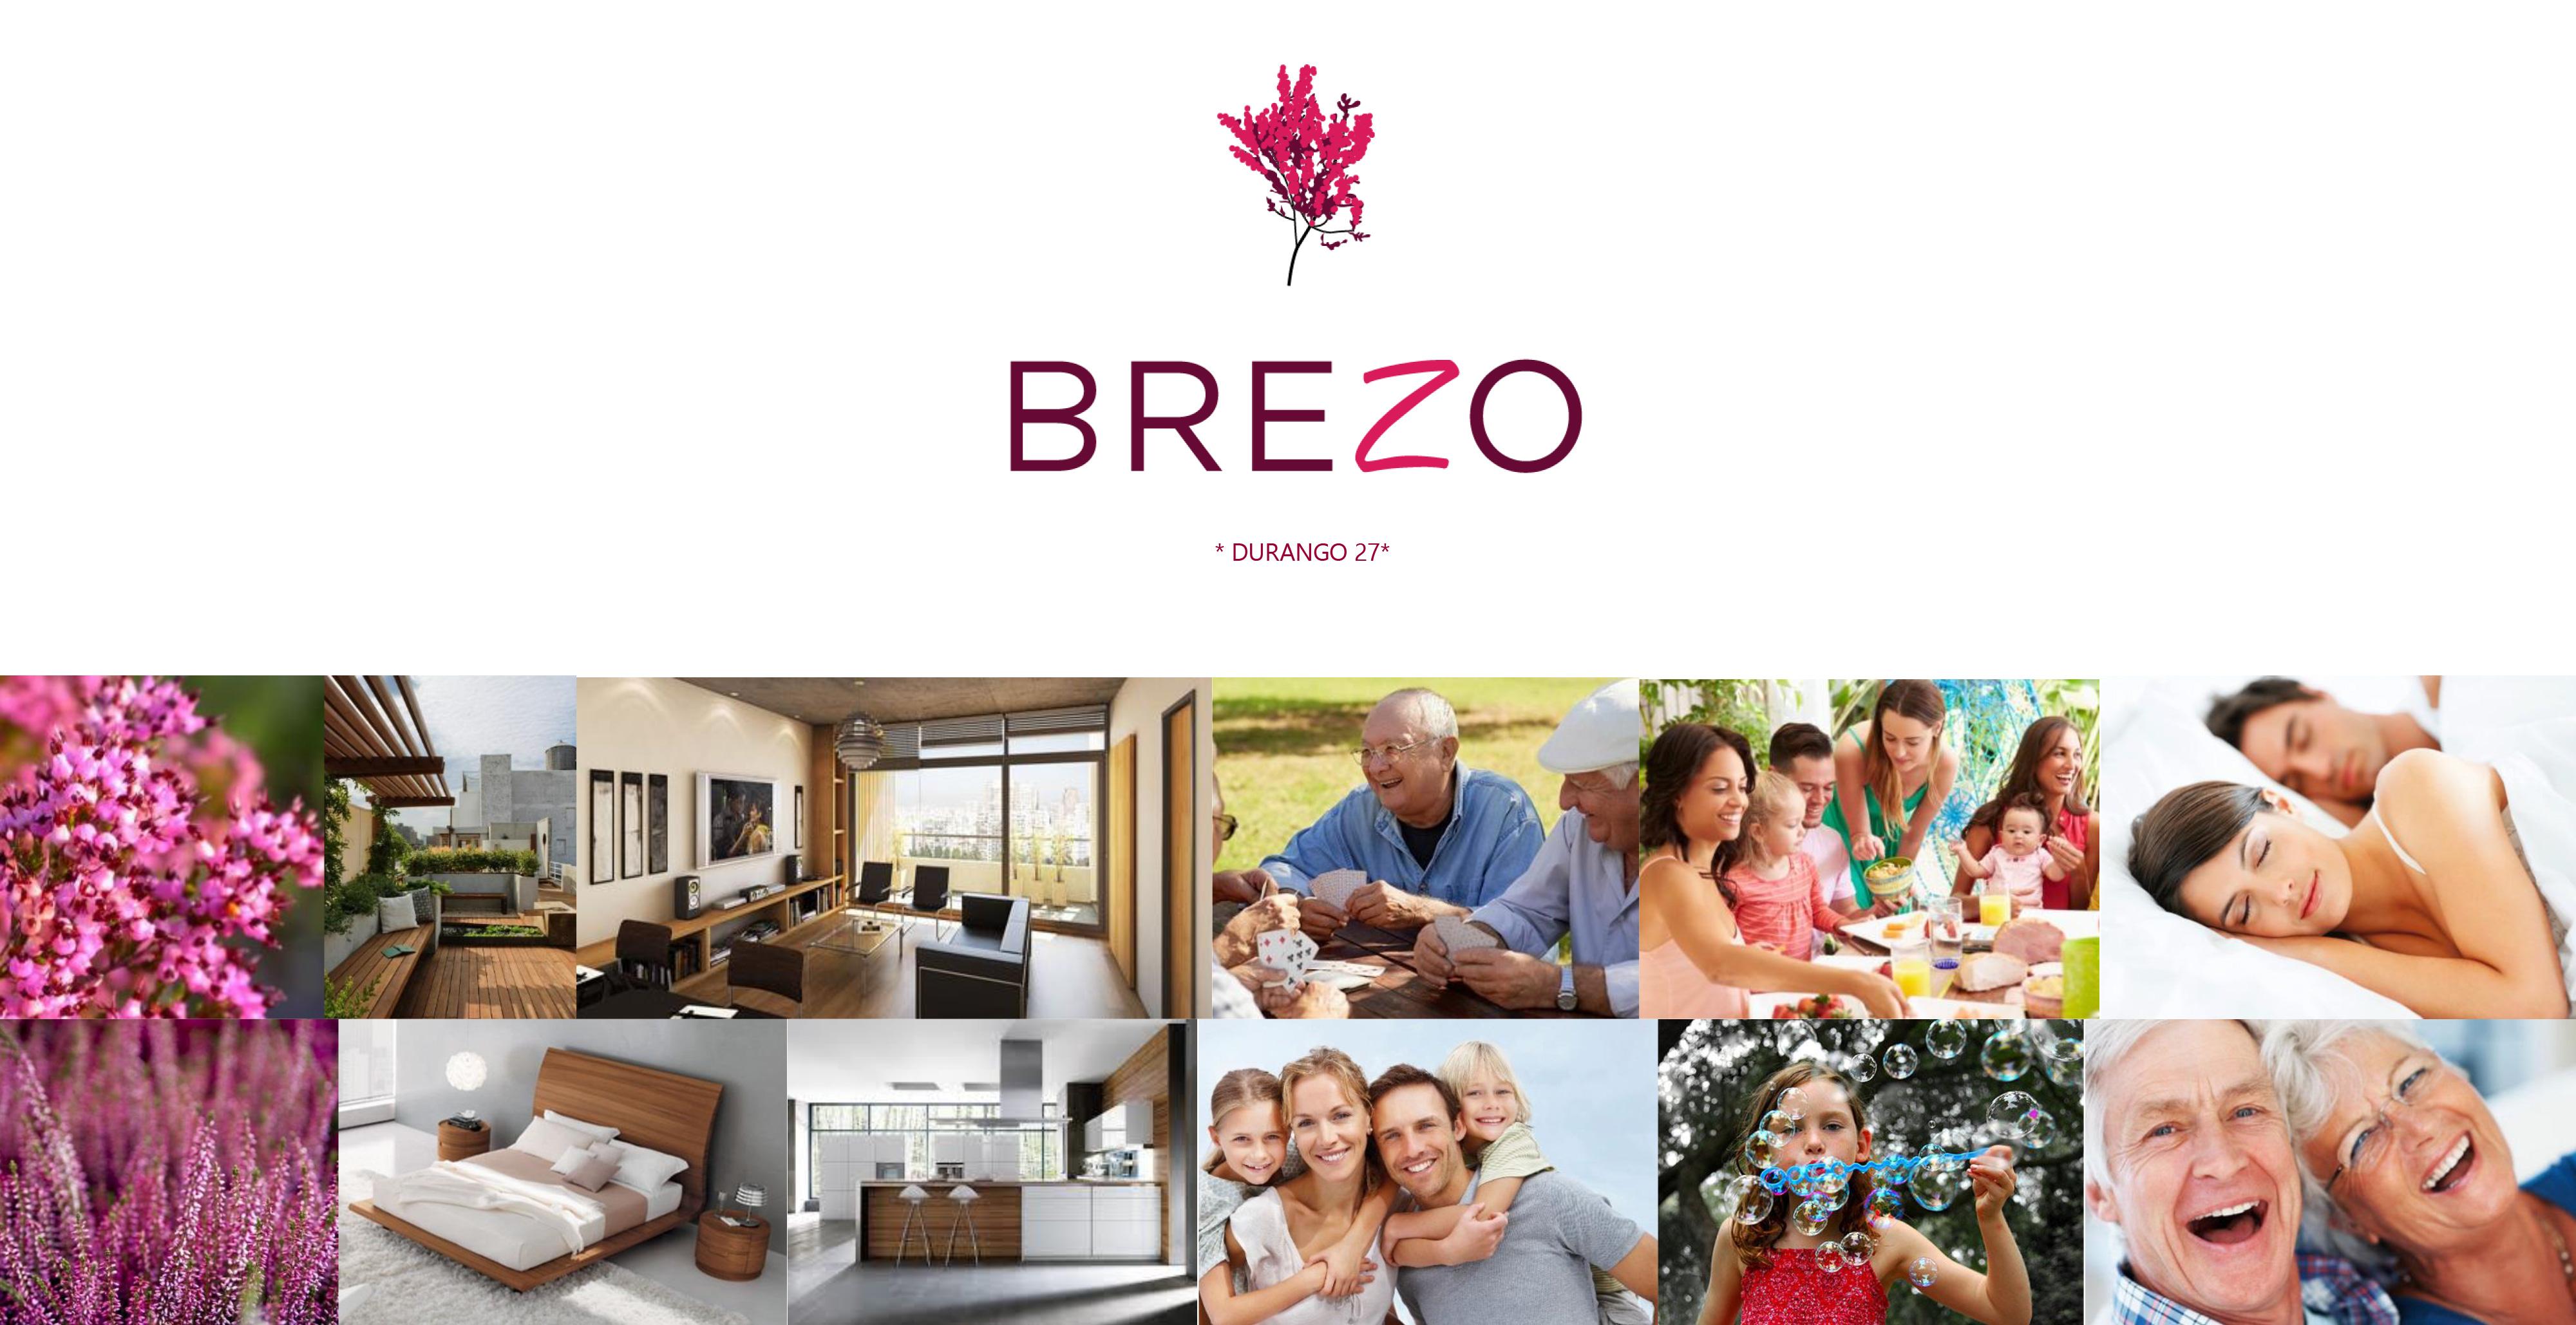 Brezo Durango 27